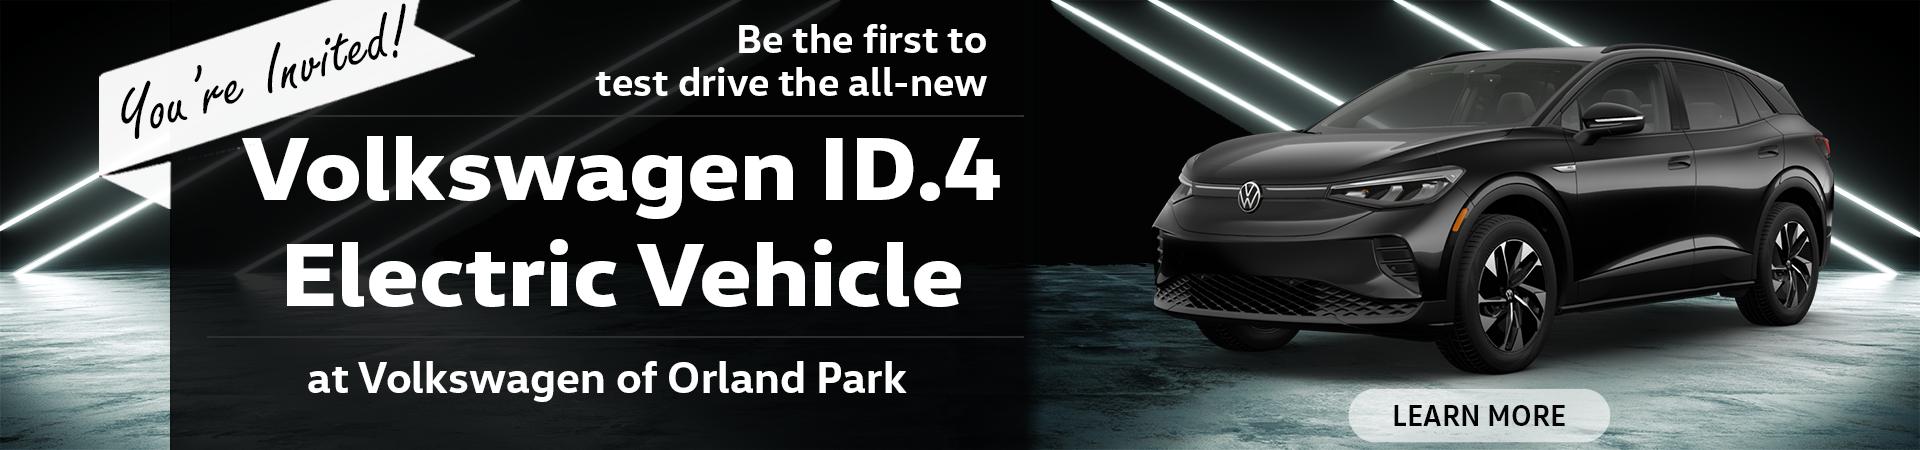 VW Orland Park ID.4 Test Drive